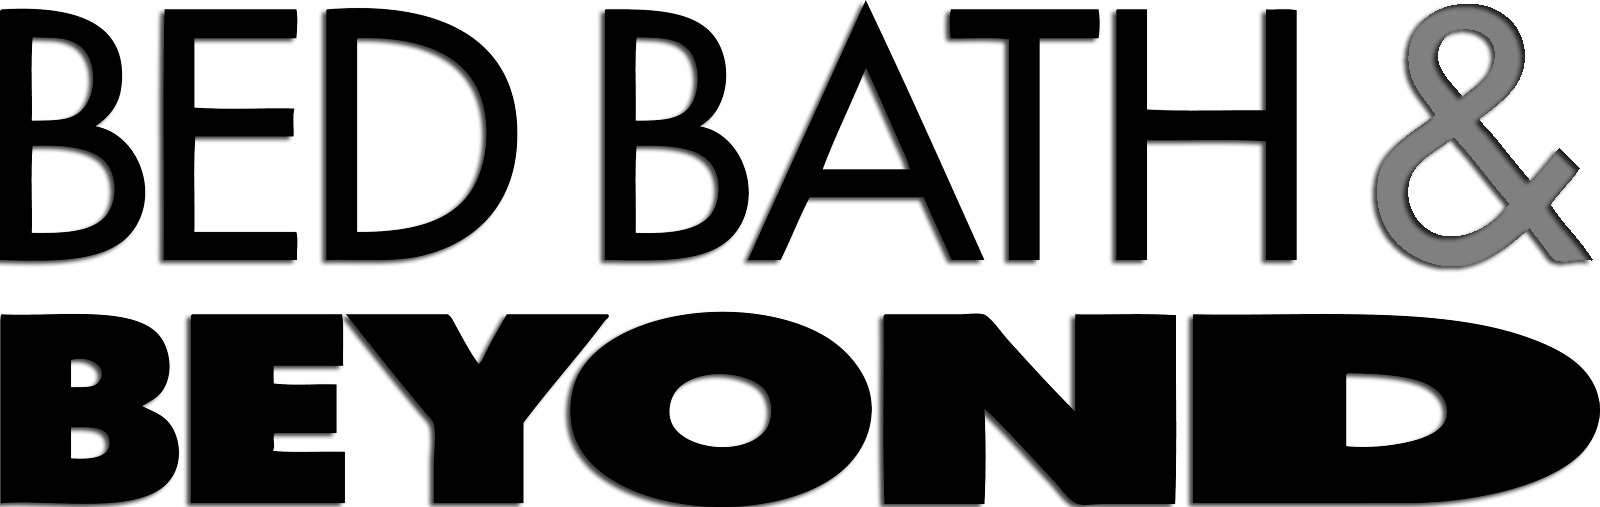 bed-bath-beyond-logo.png